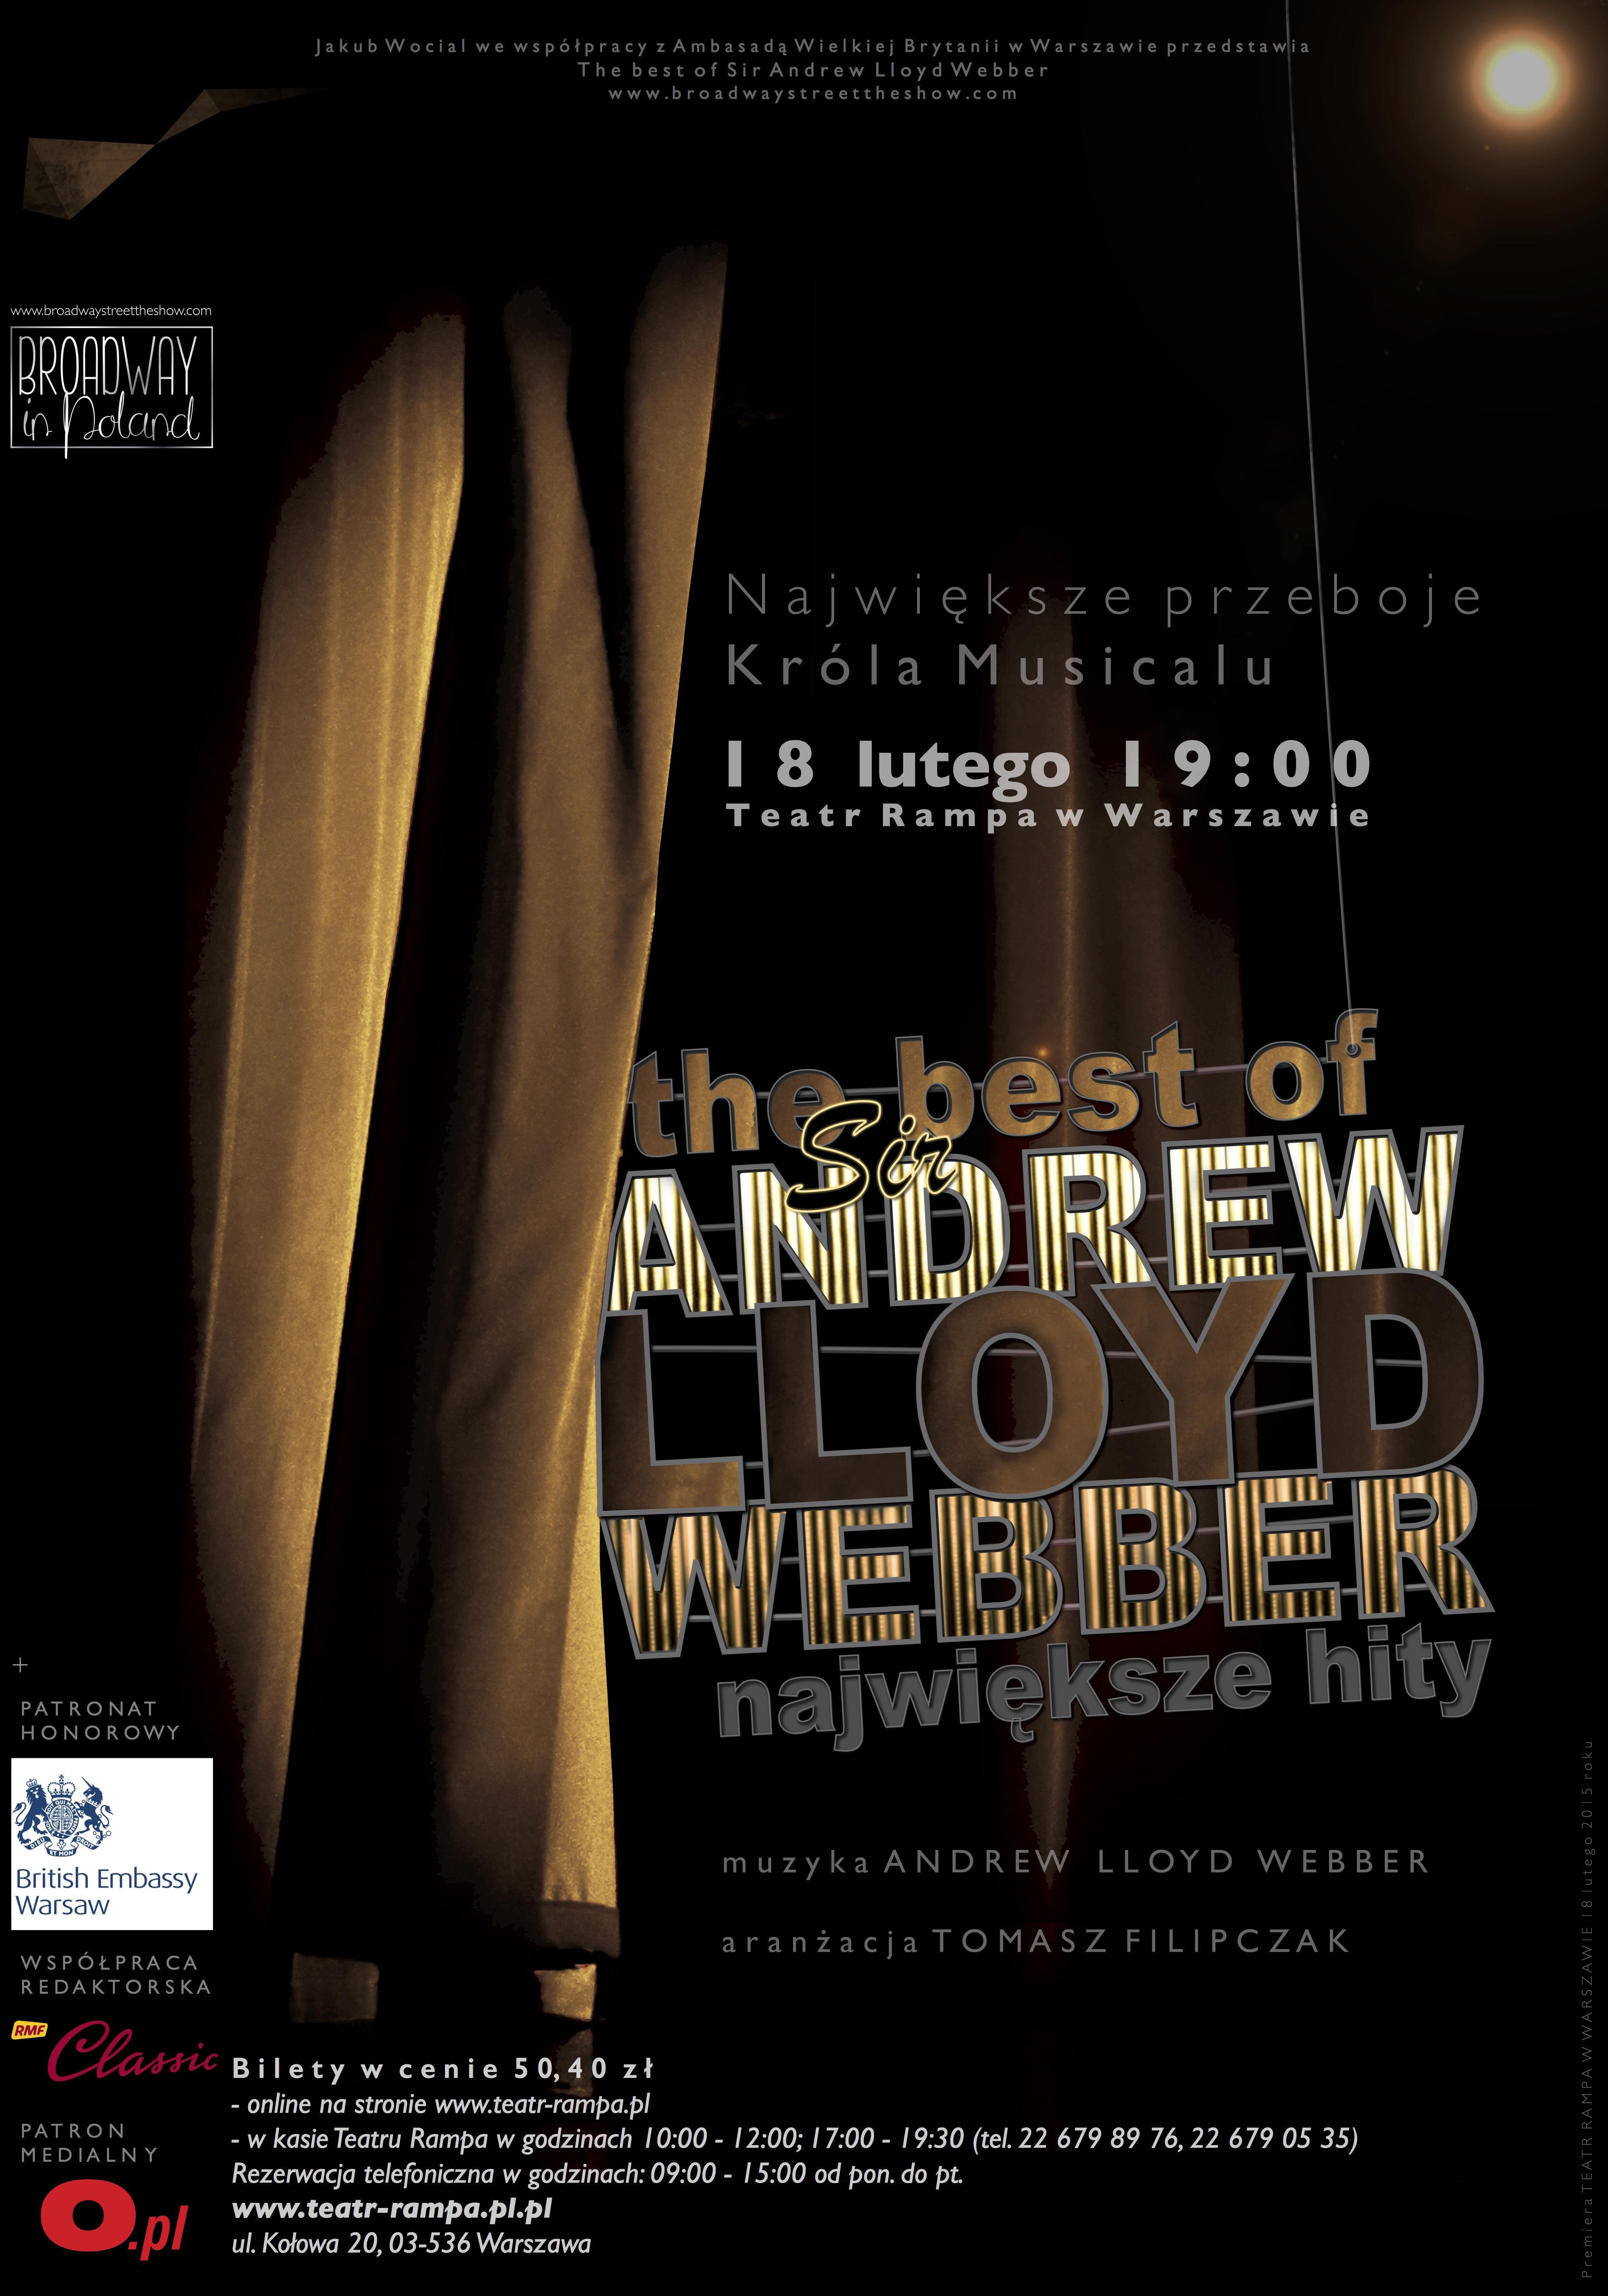 """The Best of Sir Andrew Lloyd Webber"", plakat (źródło: materiały prasowe organizatora)"